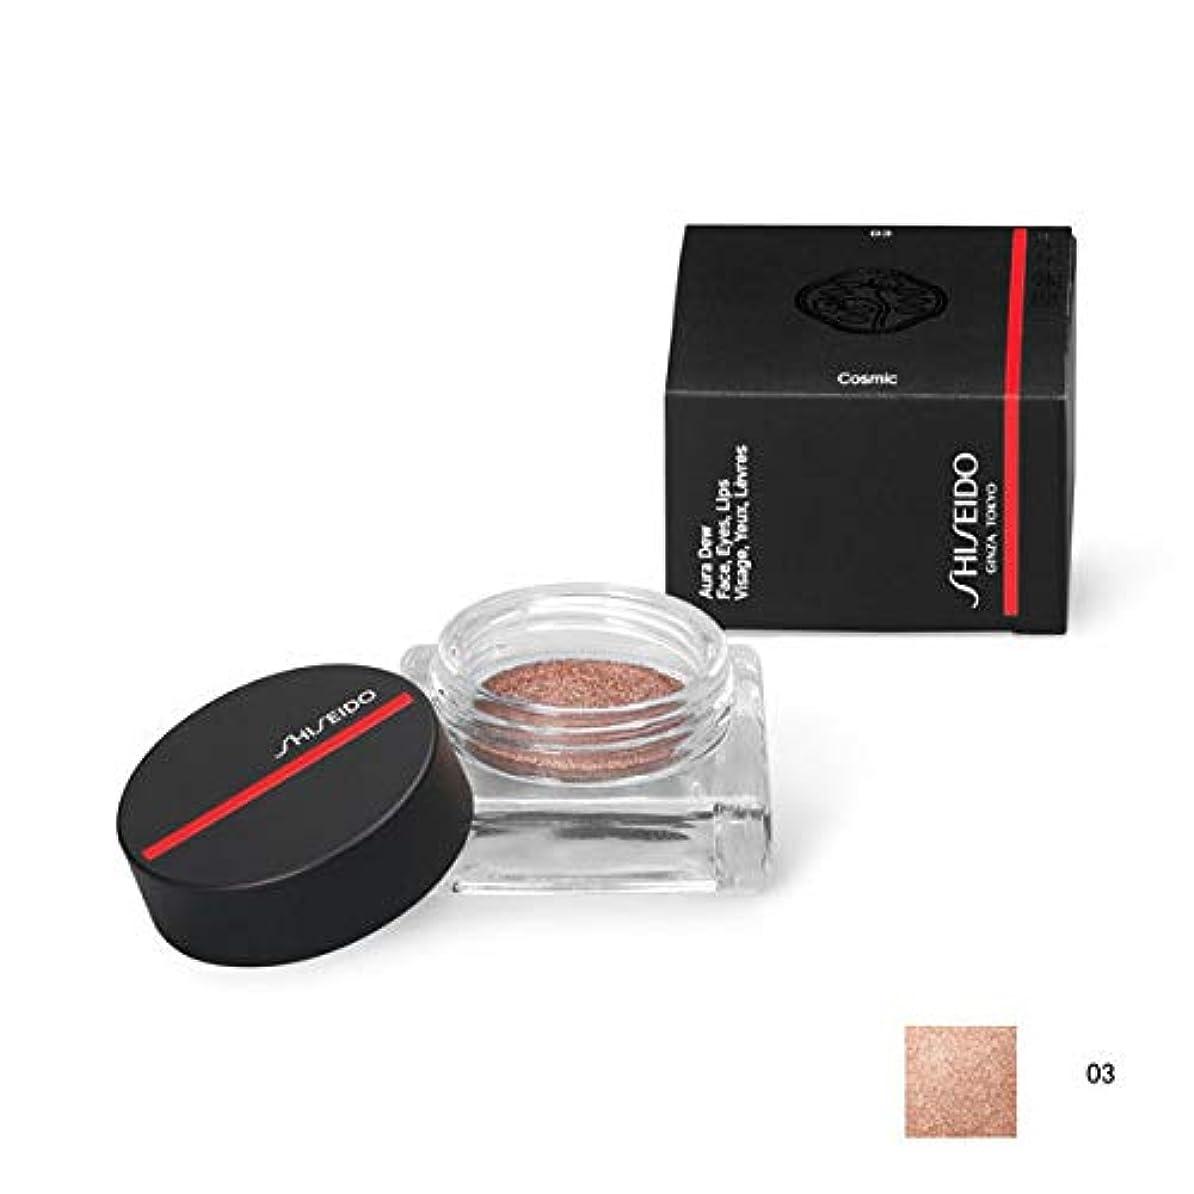 SHISEIDO Makeup(資生堂 メーキャップ) SHISEIDO(資生堂) SHISEIDO オーラデュウ プリズム 4.8g (03)